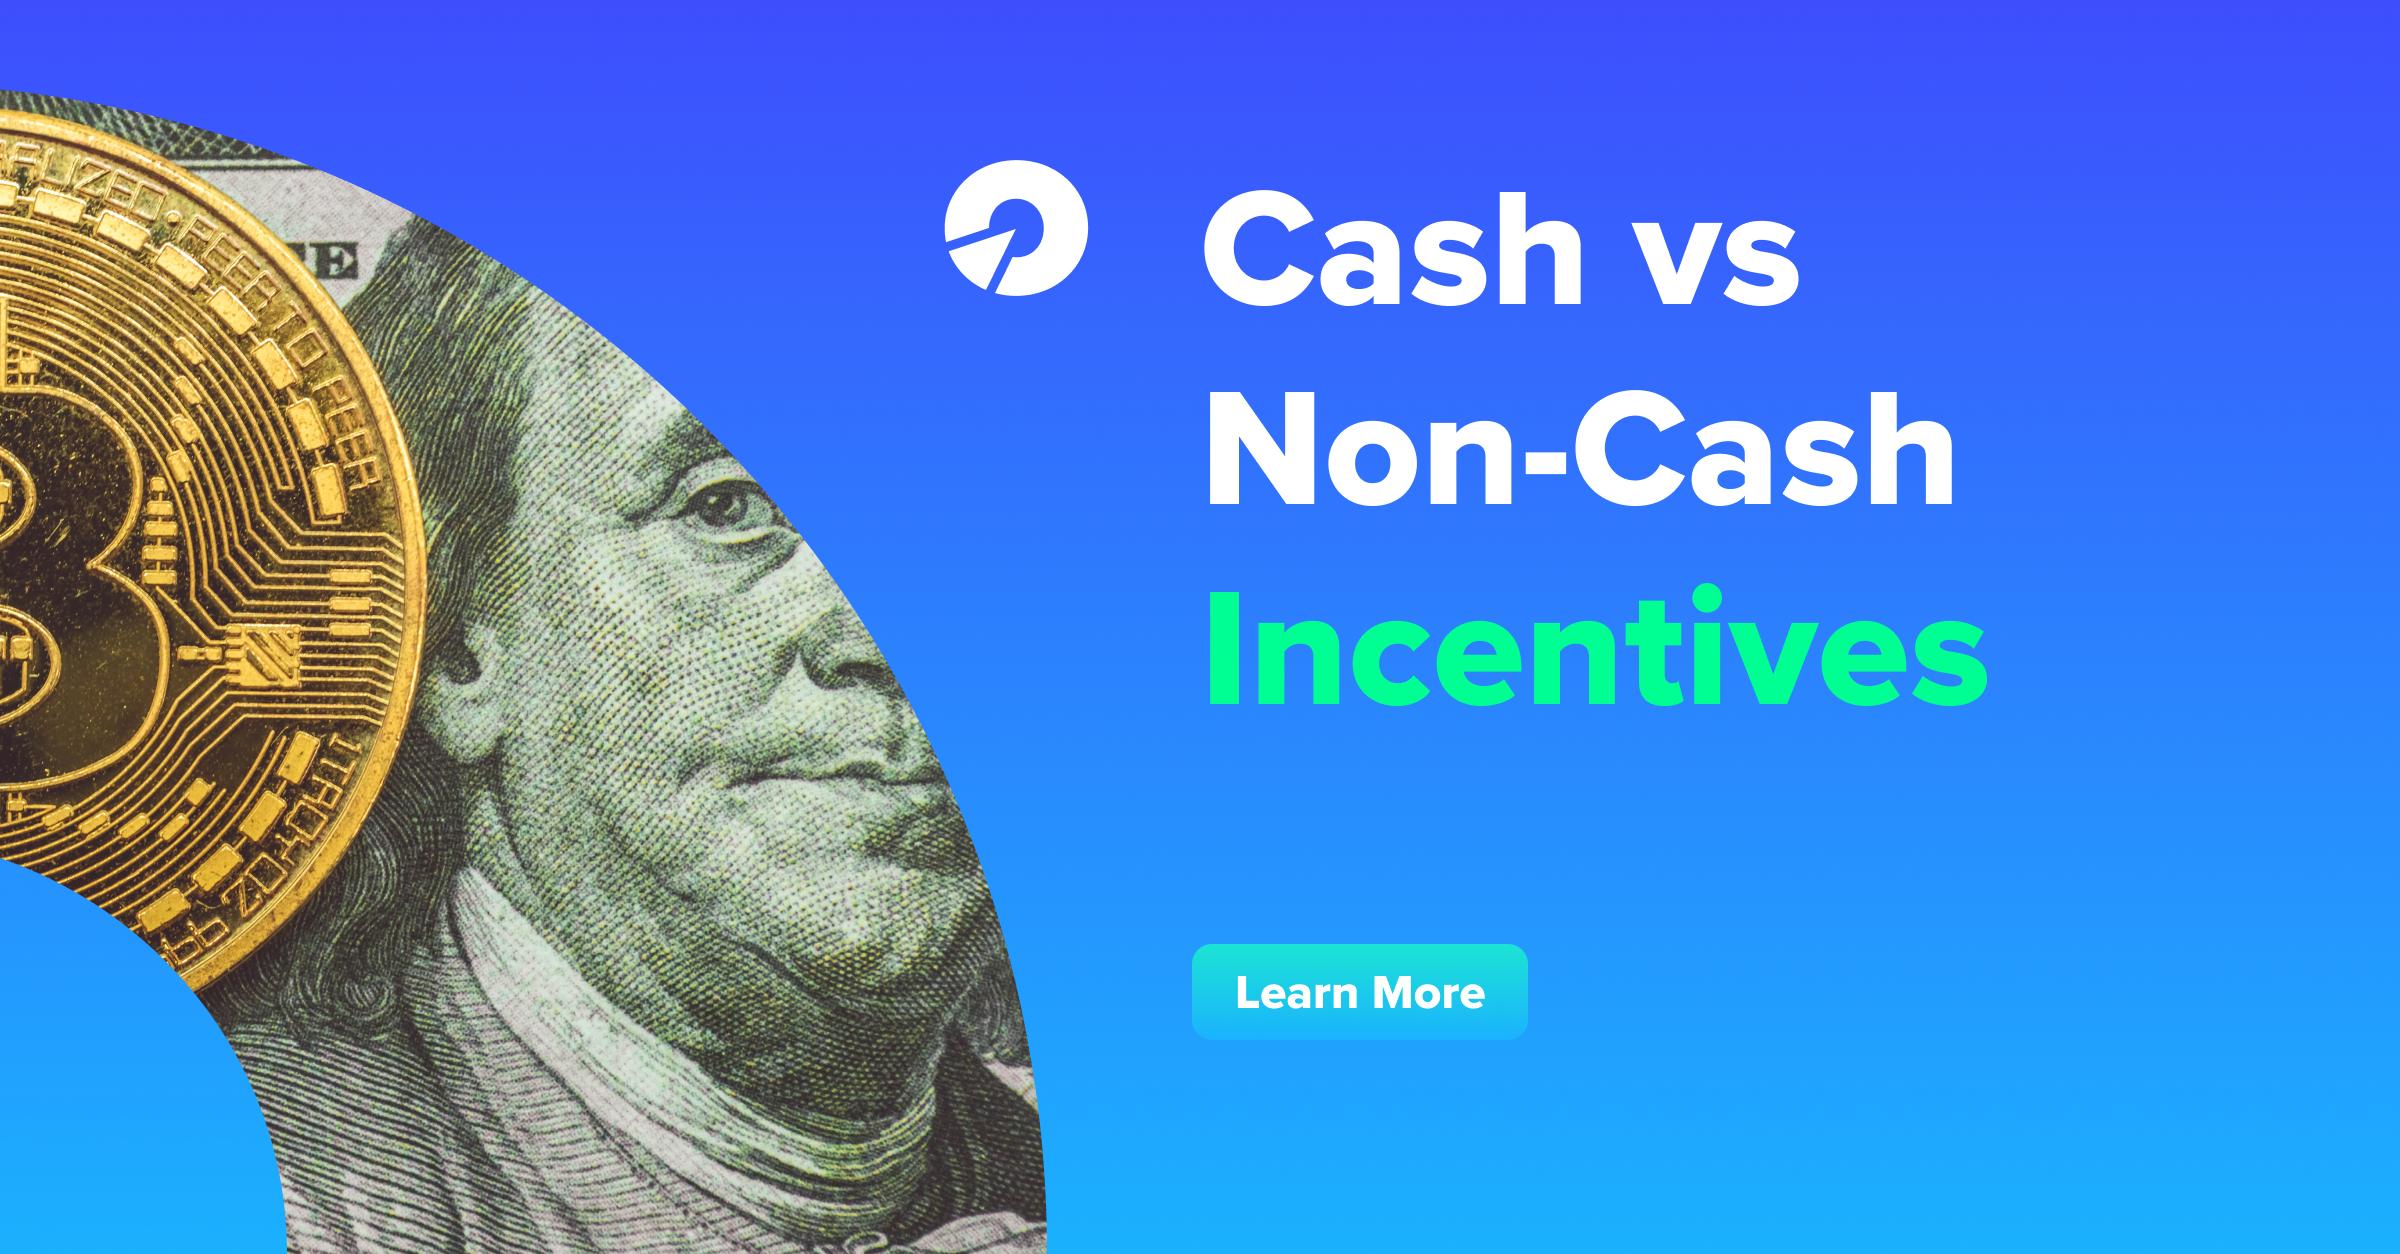 Cash vs Non-Cash Incentives